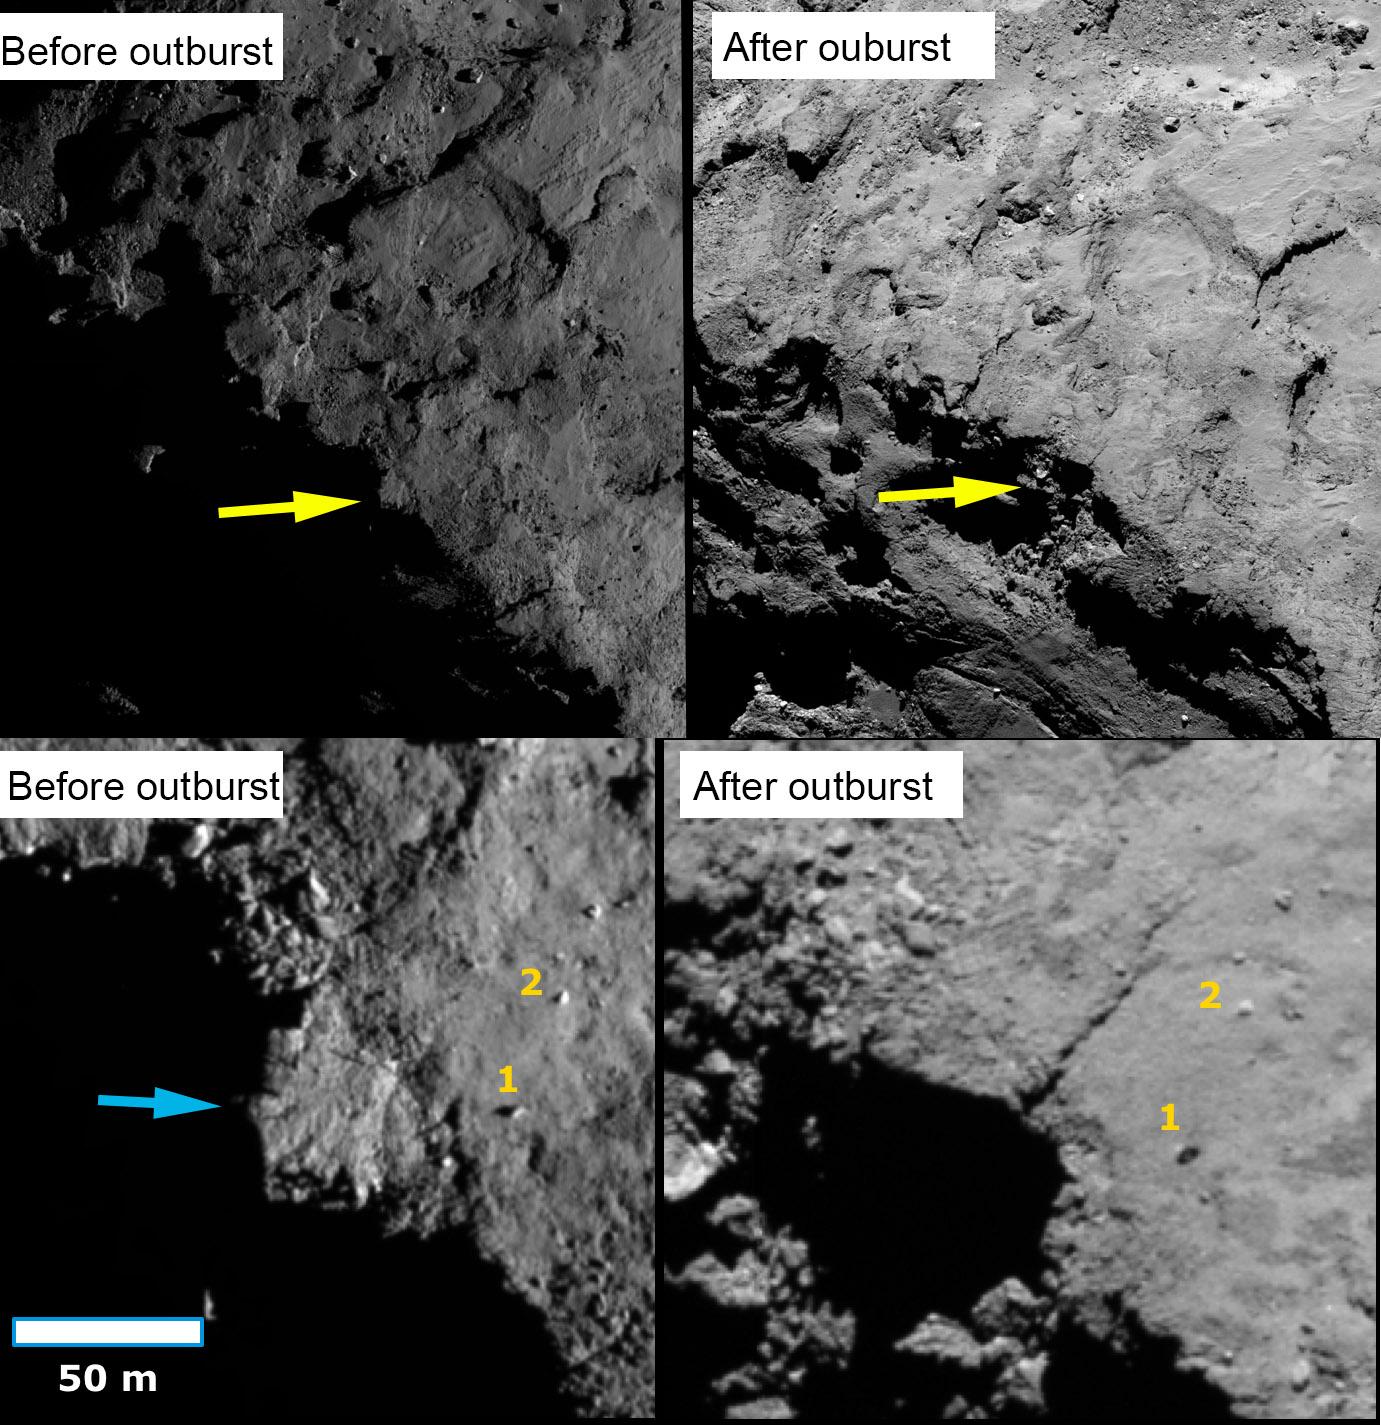 Rosetta : Mission autour de la comète 67P/Churyumov-Gerasimenko  - Page 33 Cliff_10